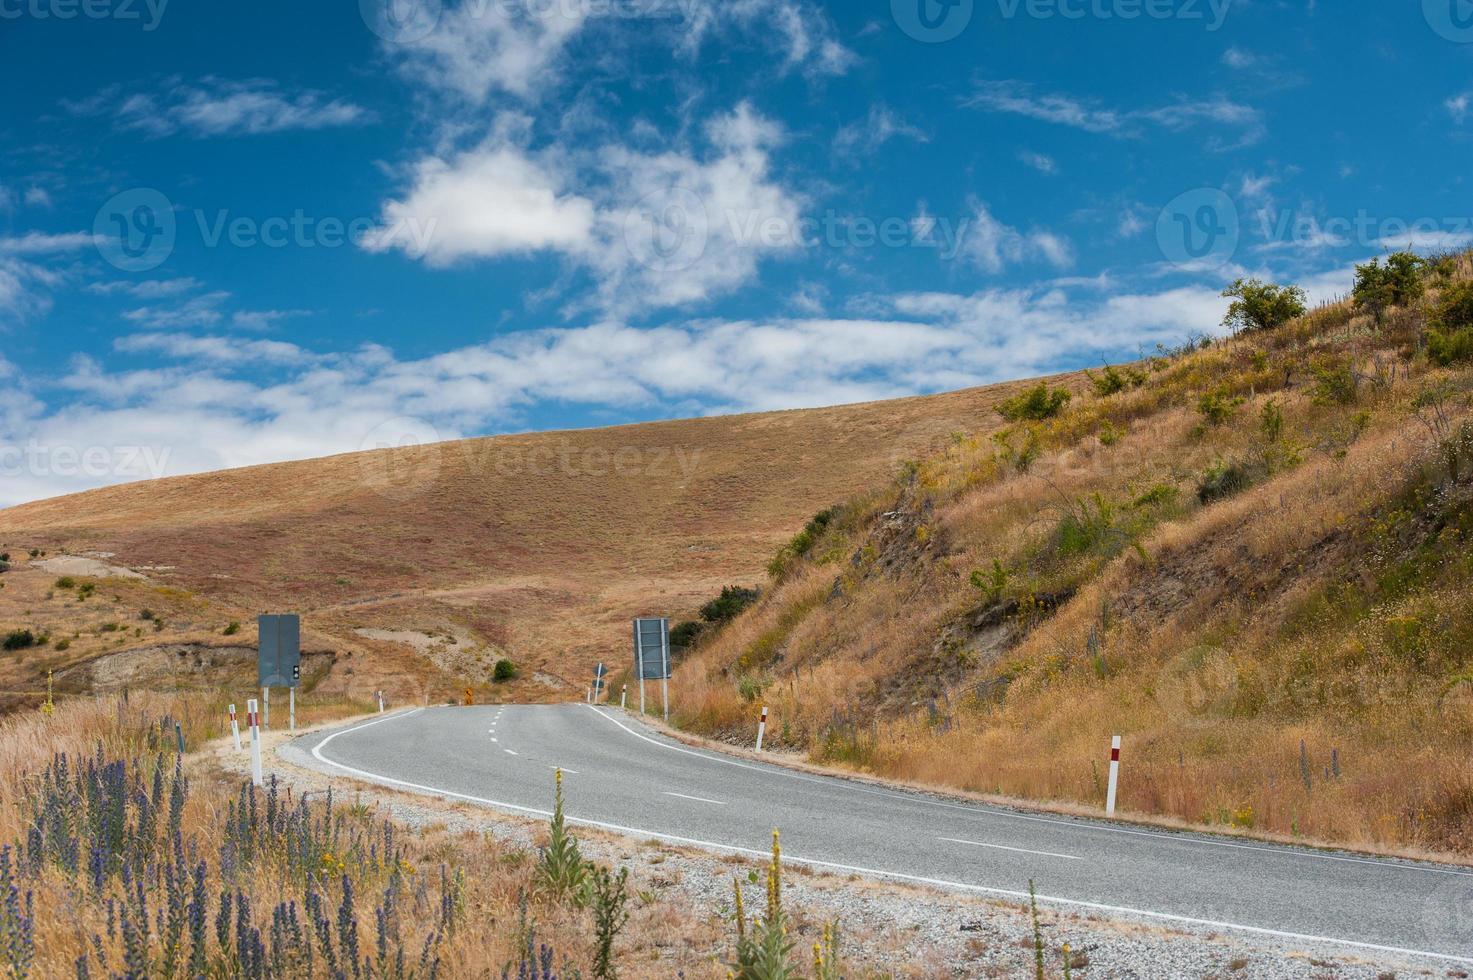 strada curva al cielo blu foto